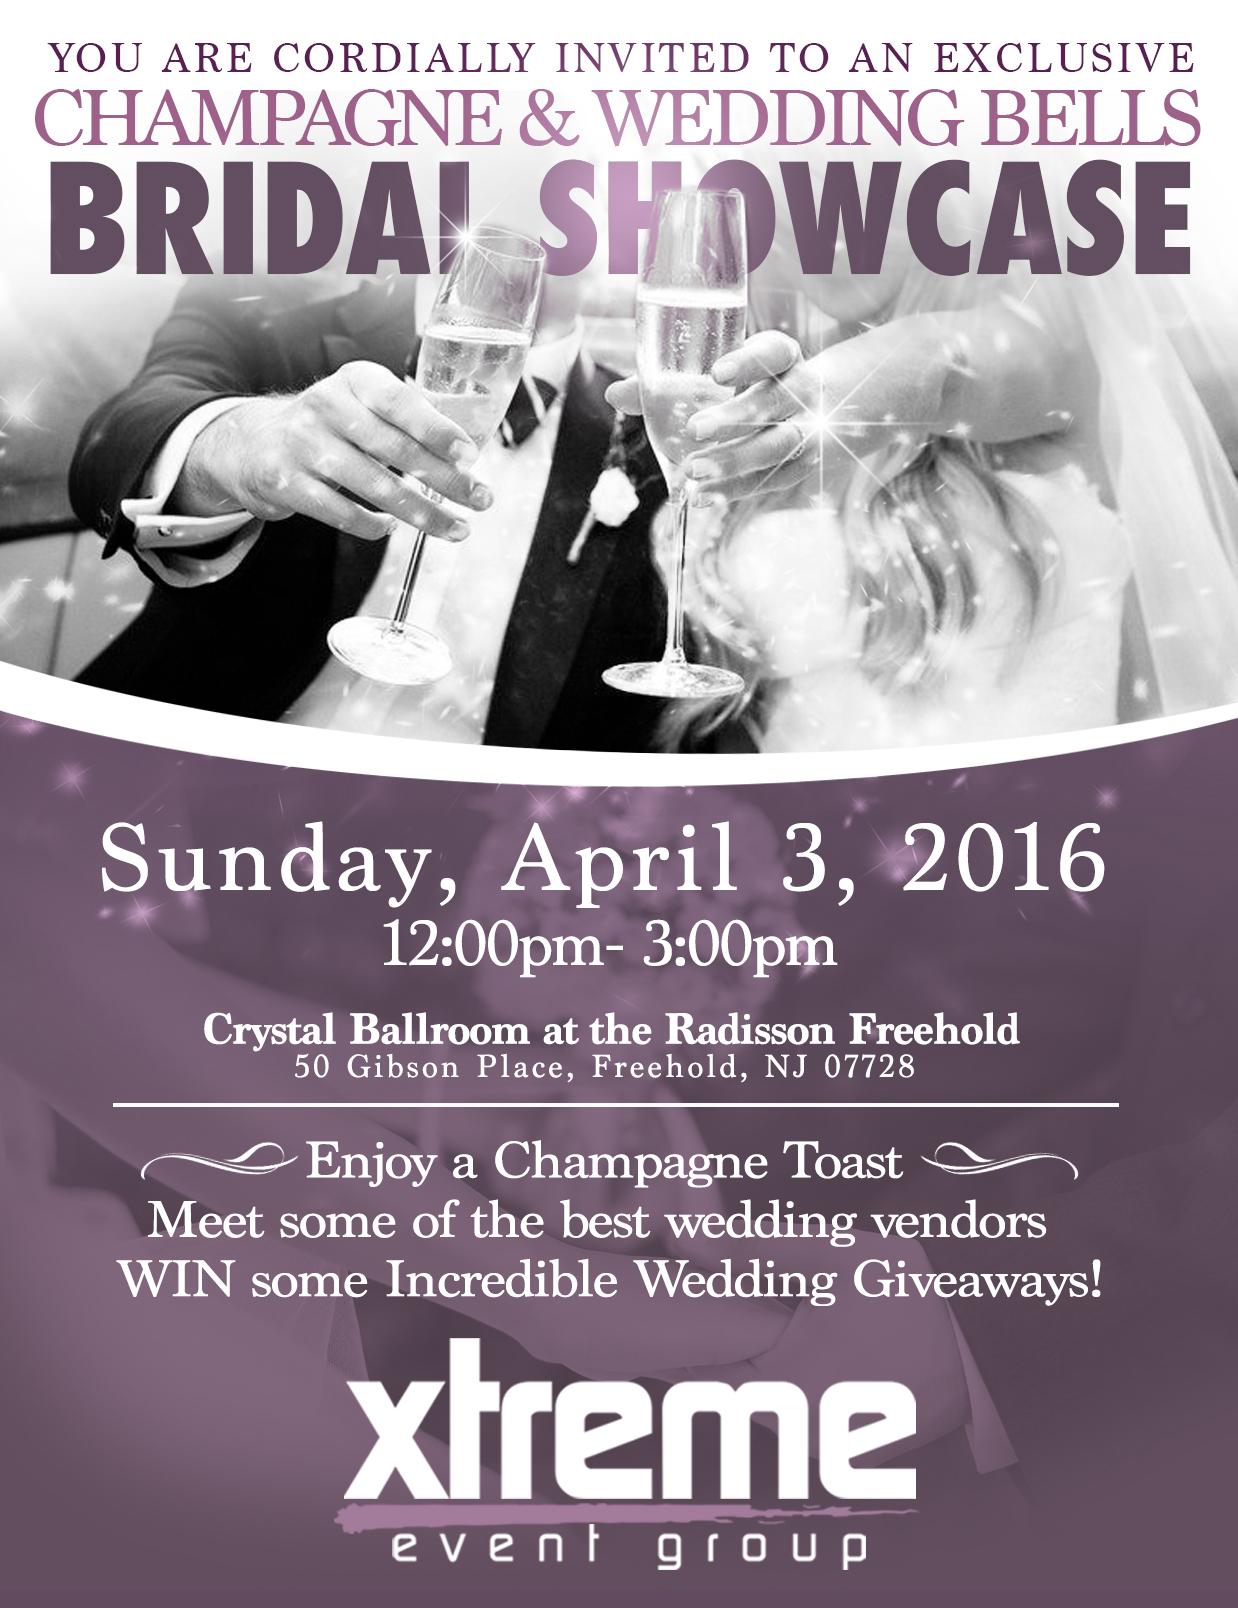 Wedding Bells Bridal Showcase Event